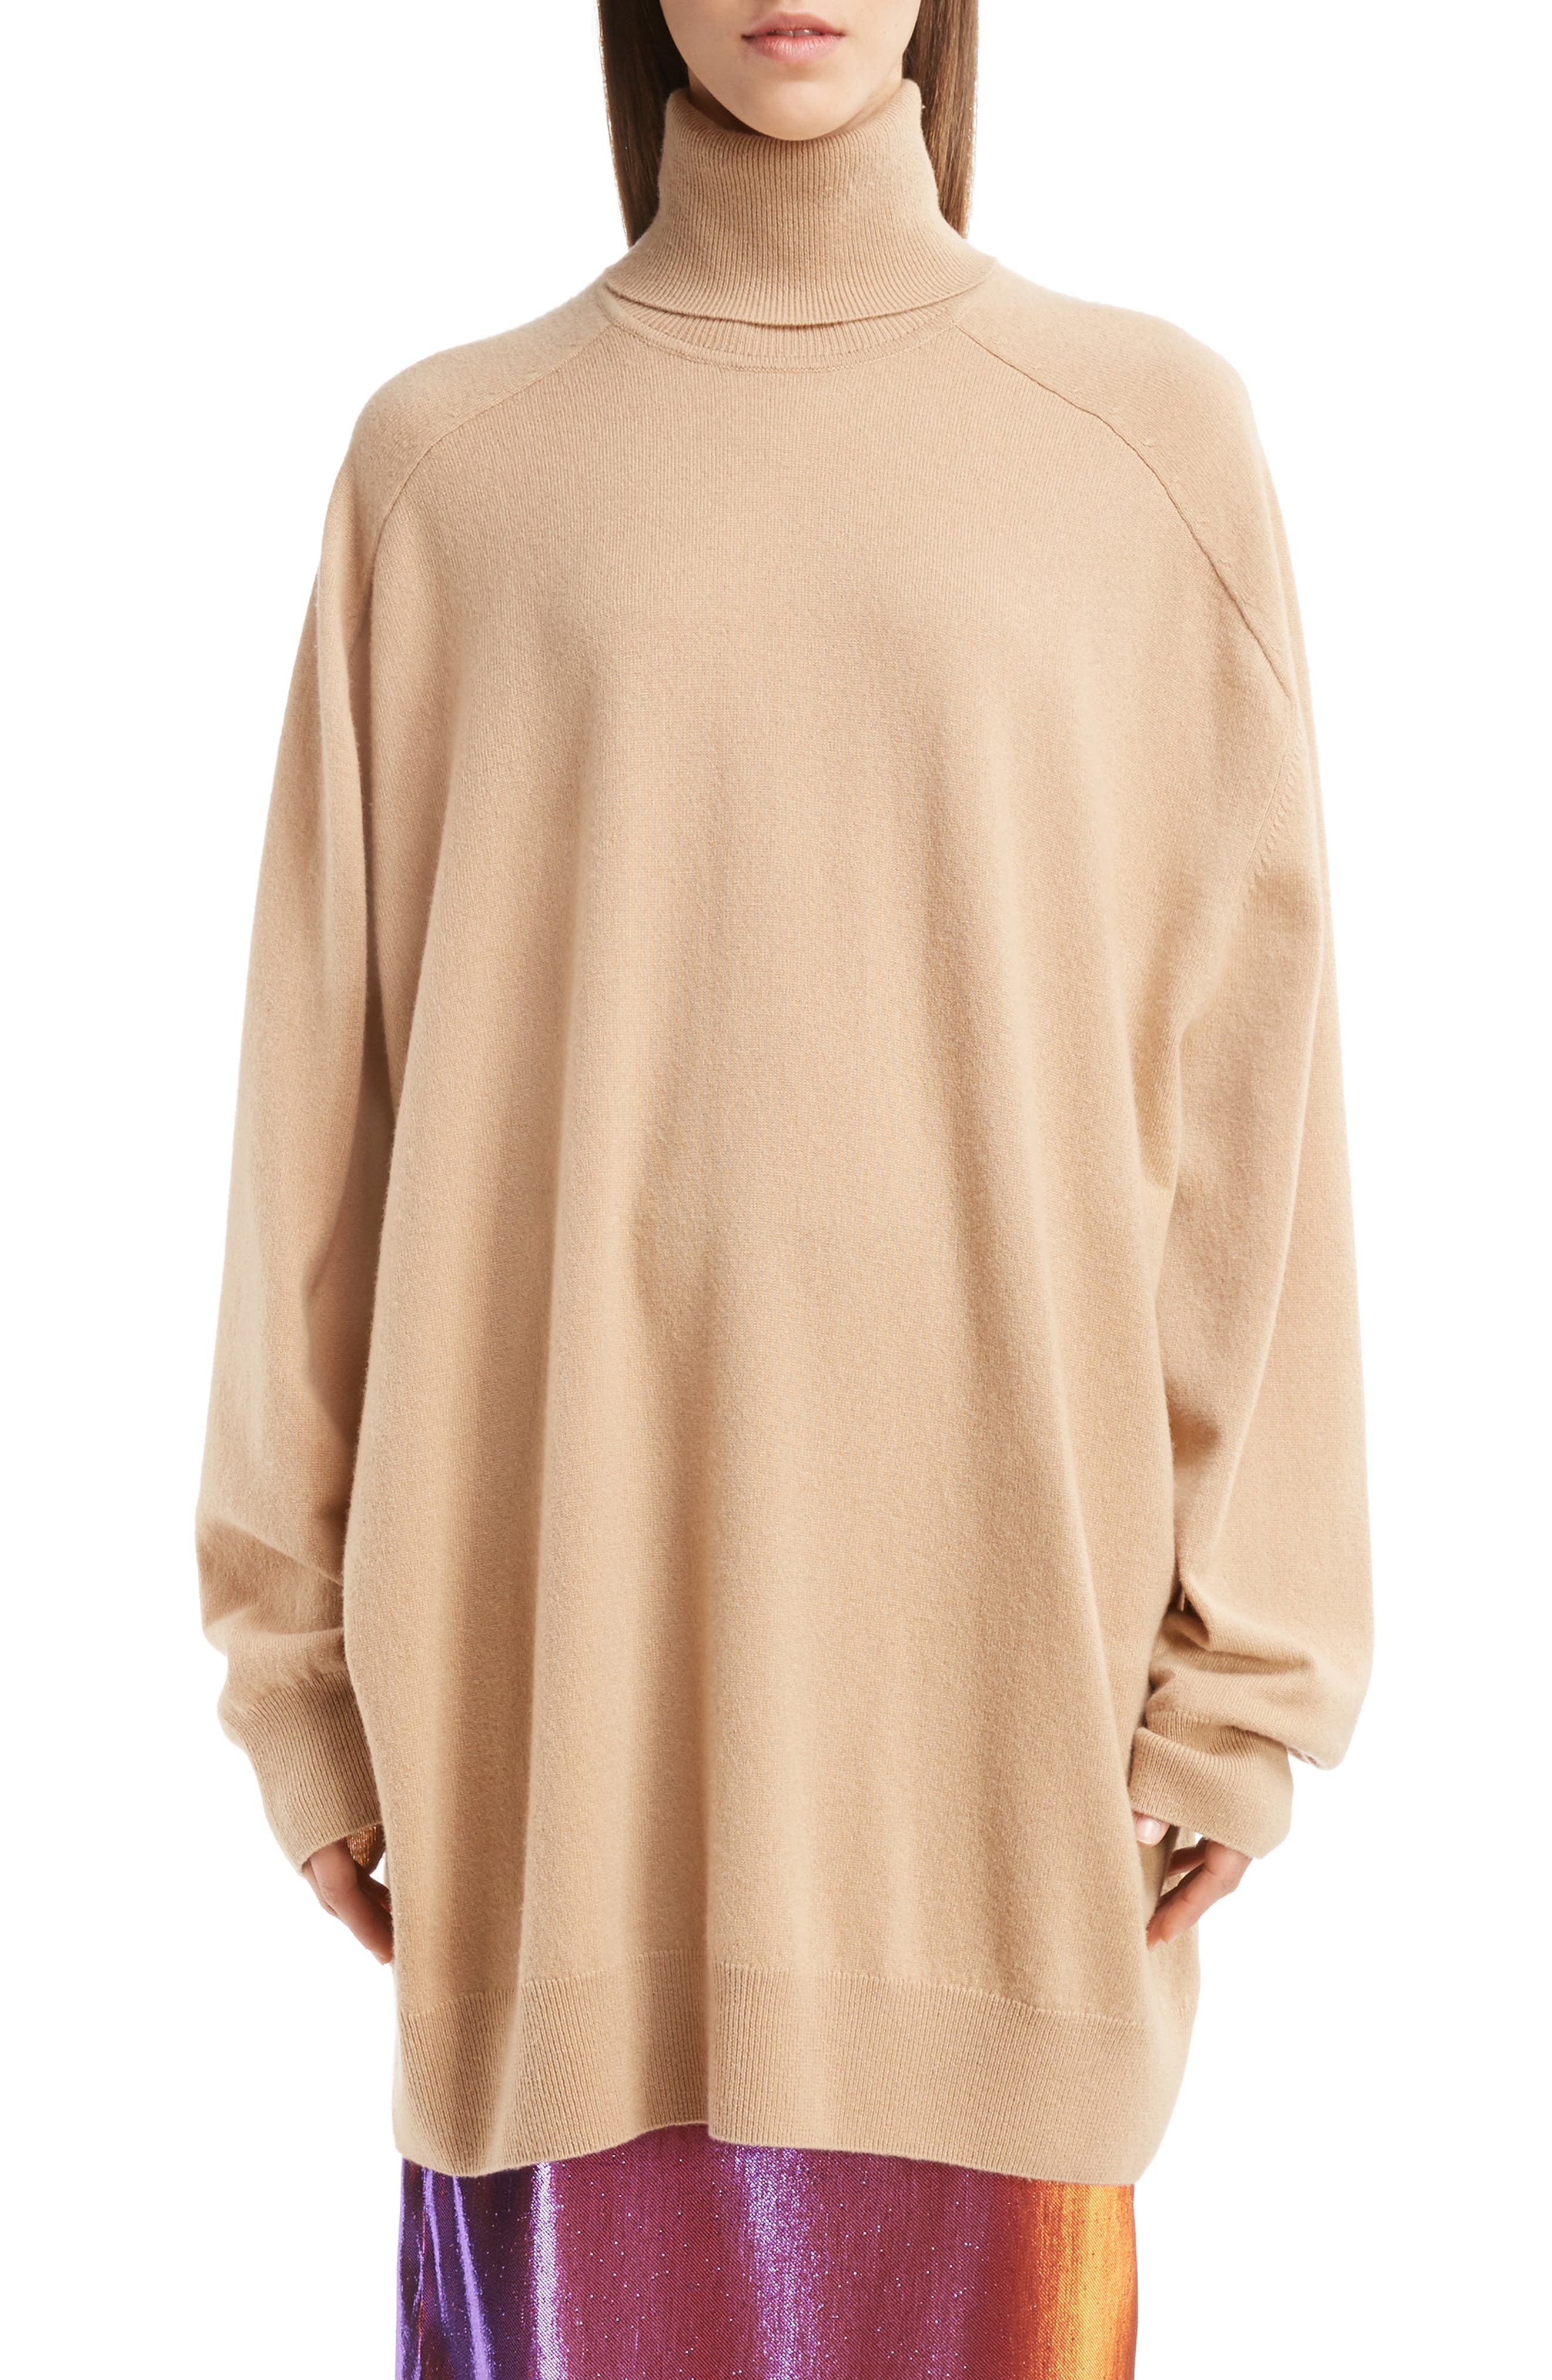 Oversized Cashmere Turtleneck Sweater,                             Main thumbnail 1, color,                             250